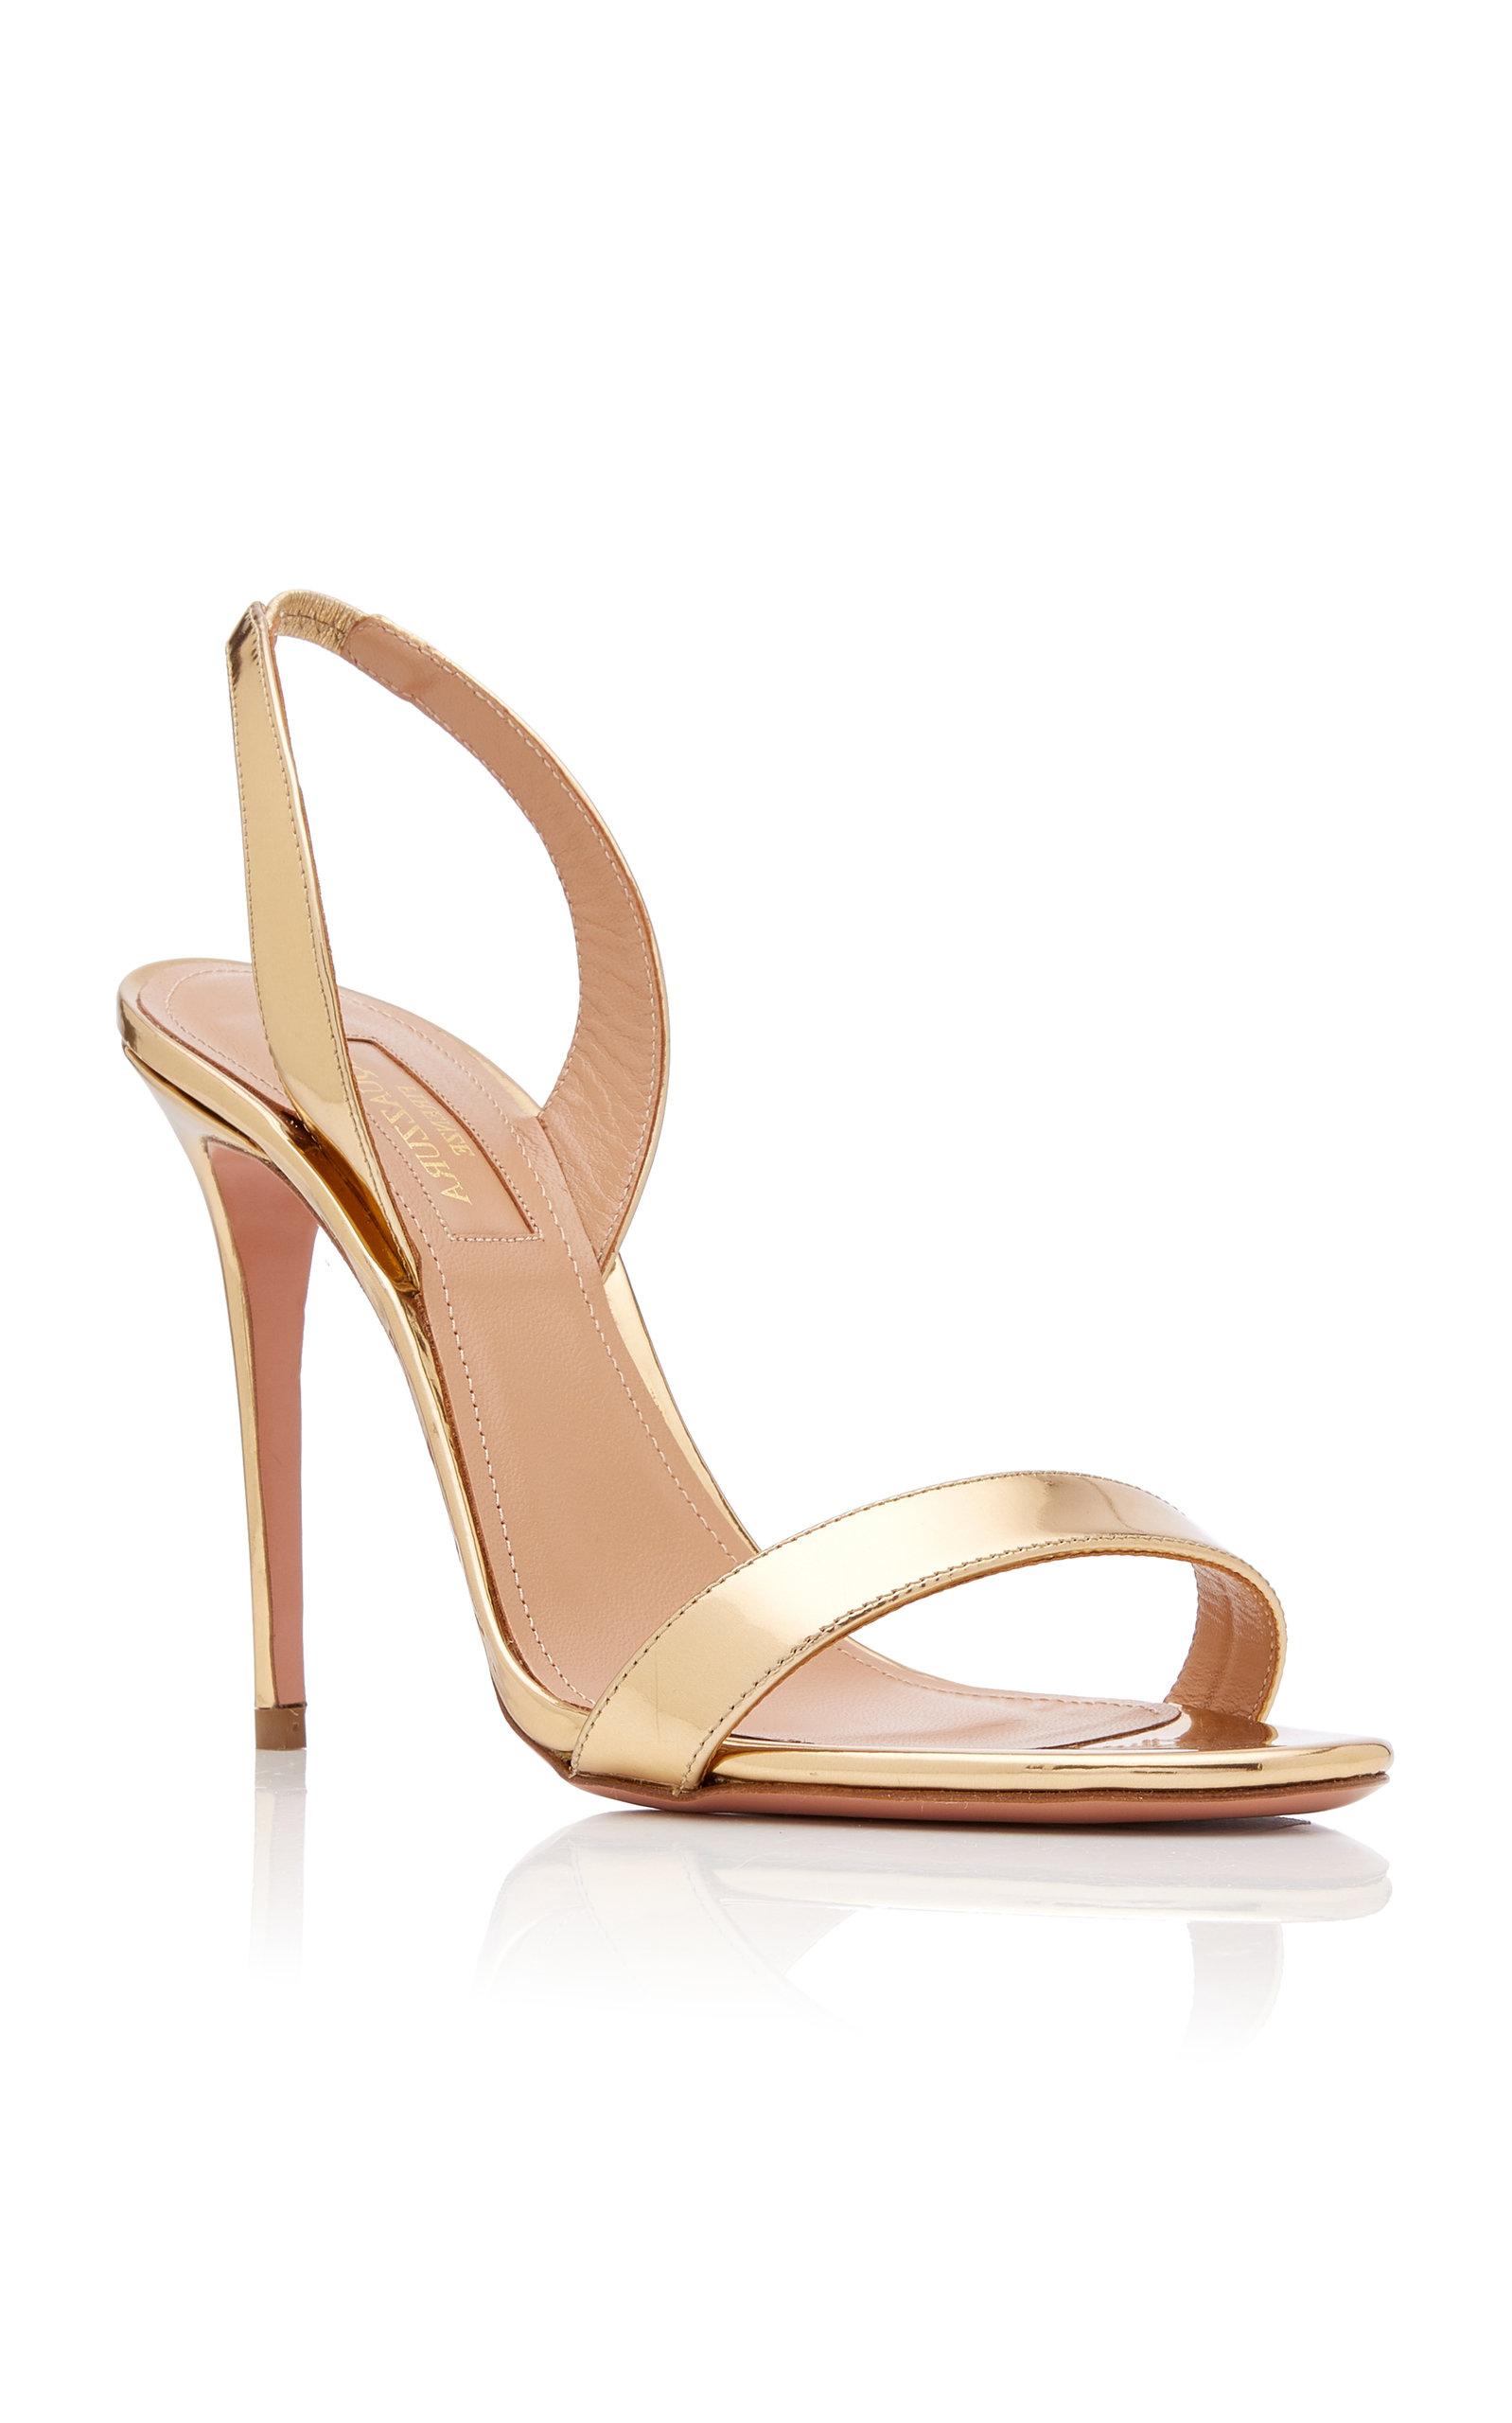 220379fff AquazzuraSo Nude Metallic Leather Slingback Sandals. CLOSE. Loading.  Loading. Loading. Loading